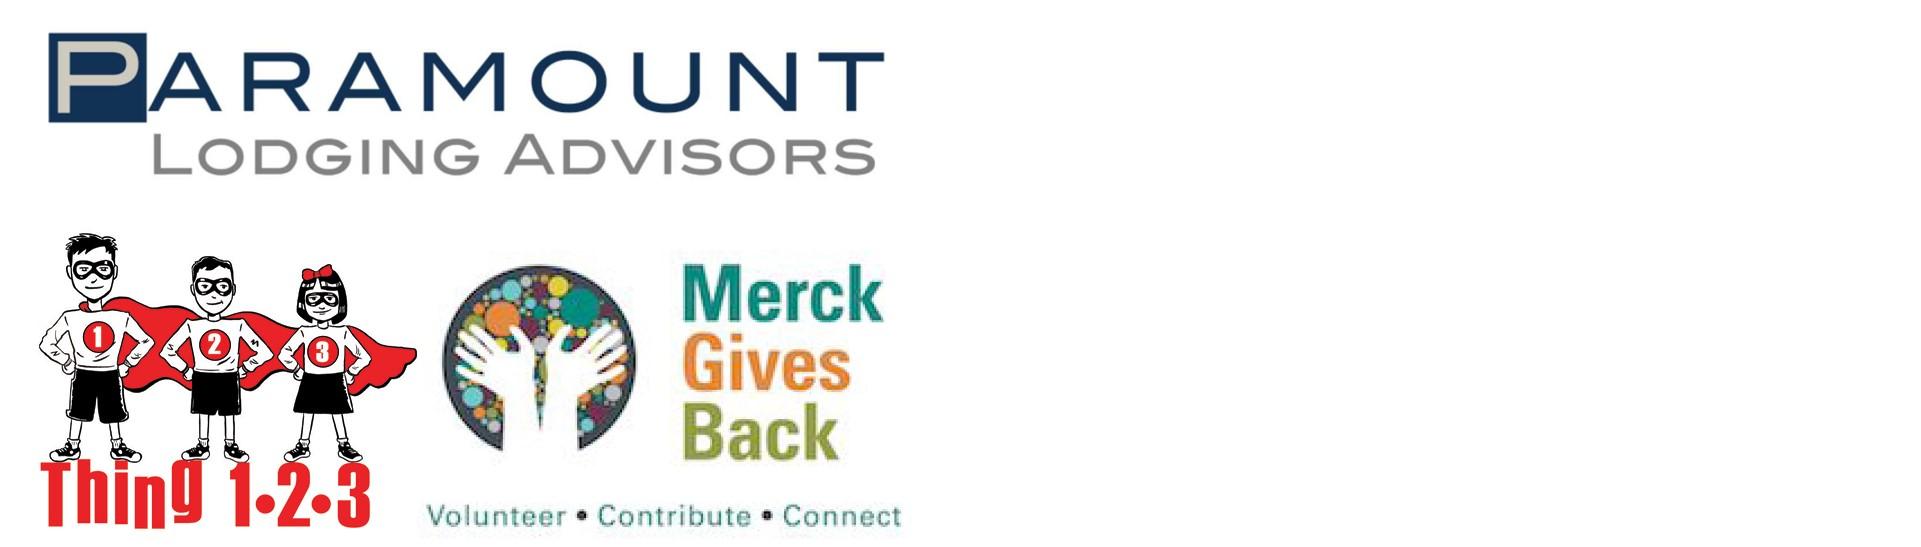 Paramount Lodging Advisors, Merck, Thing 1 2 3